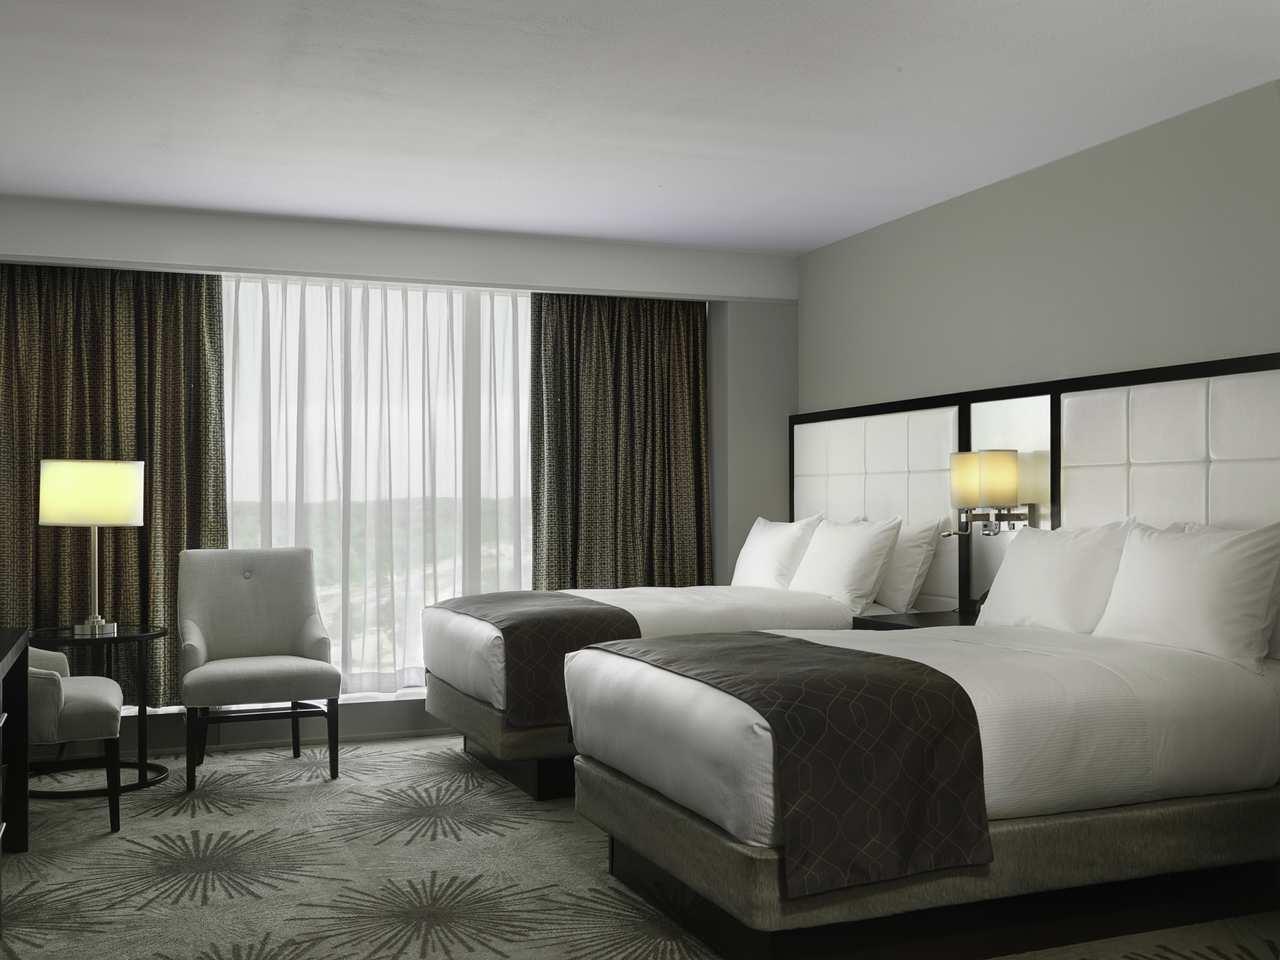 DoubleTree by Hilton Hotel Cedar Rapids Convention Complex image 19